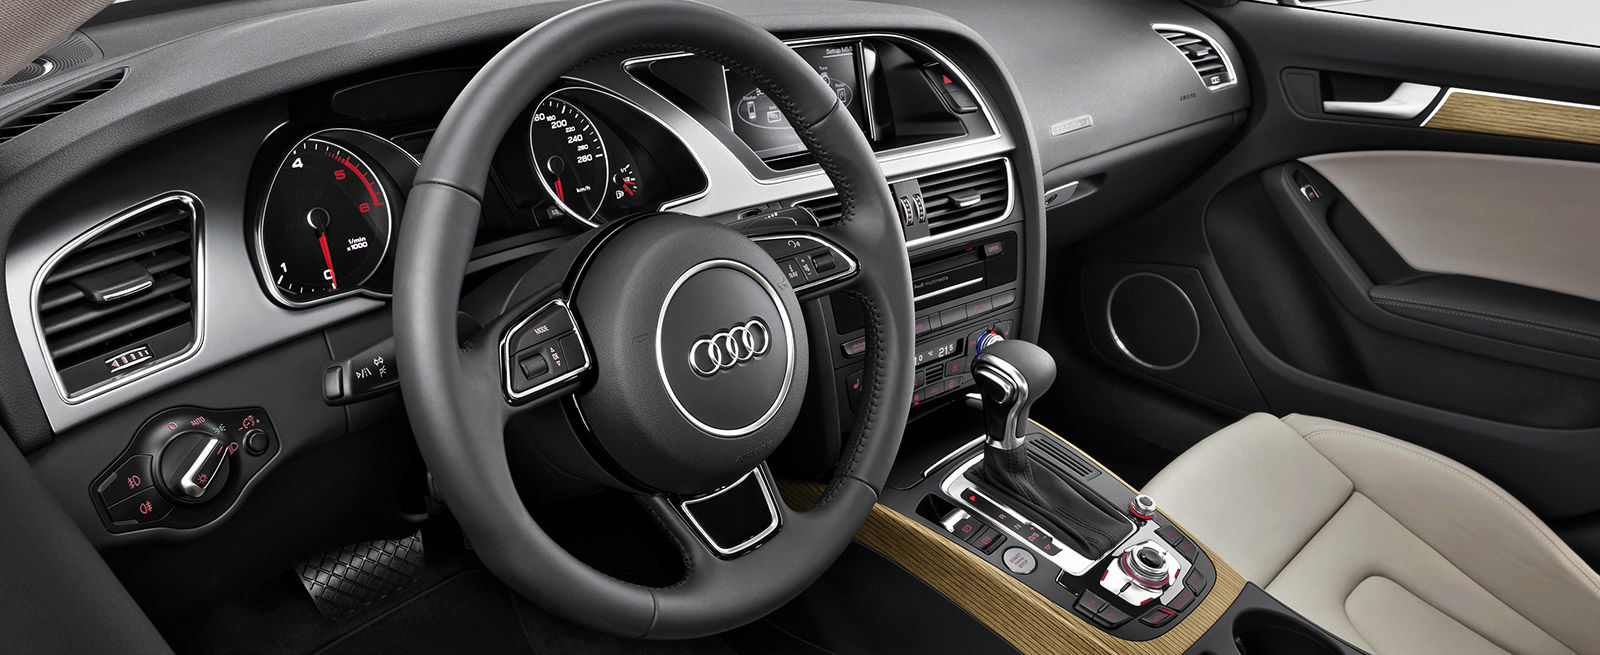 Audi A5 Sportback Cabriolet Sizes Dimensions Carwow